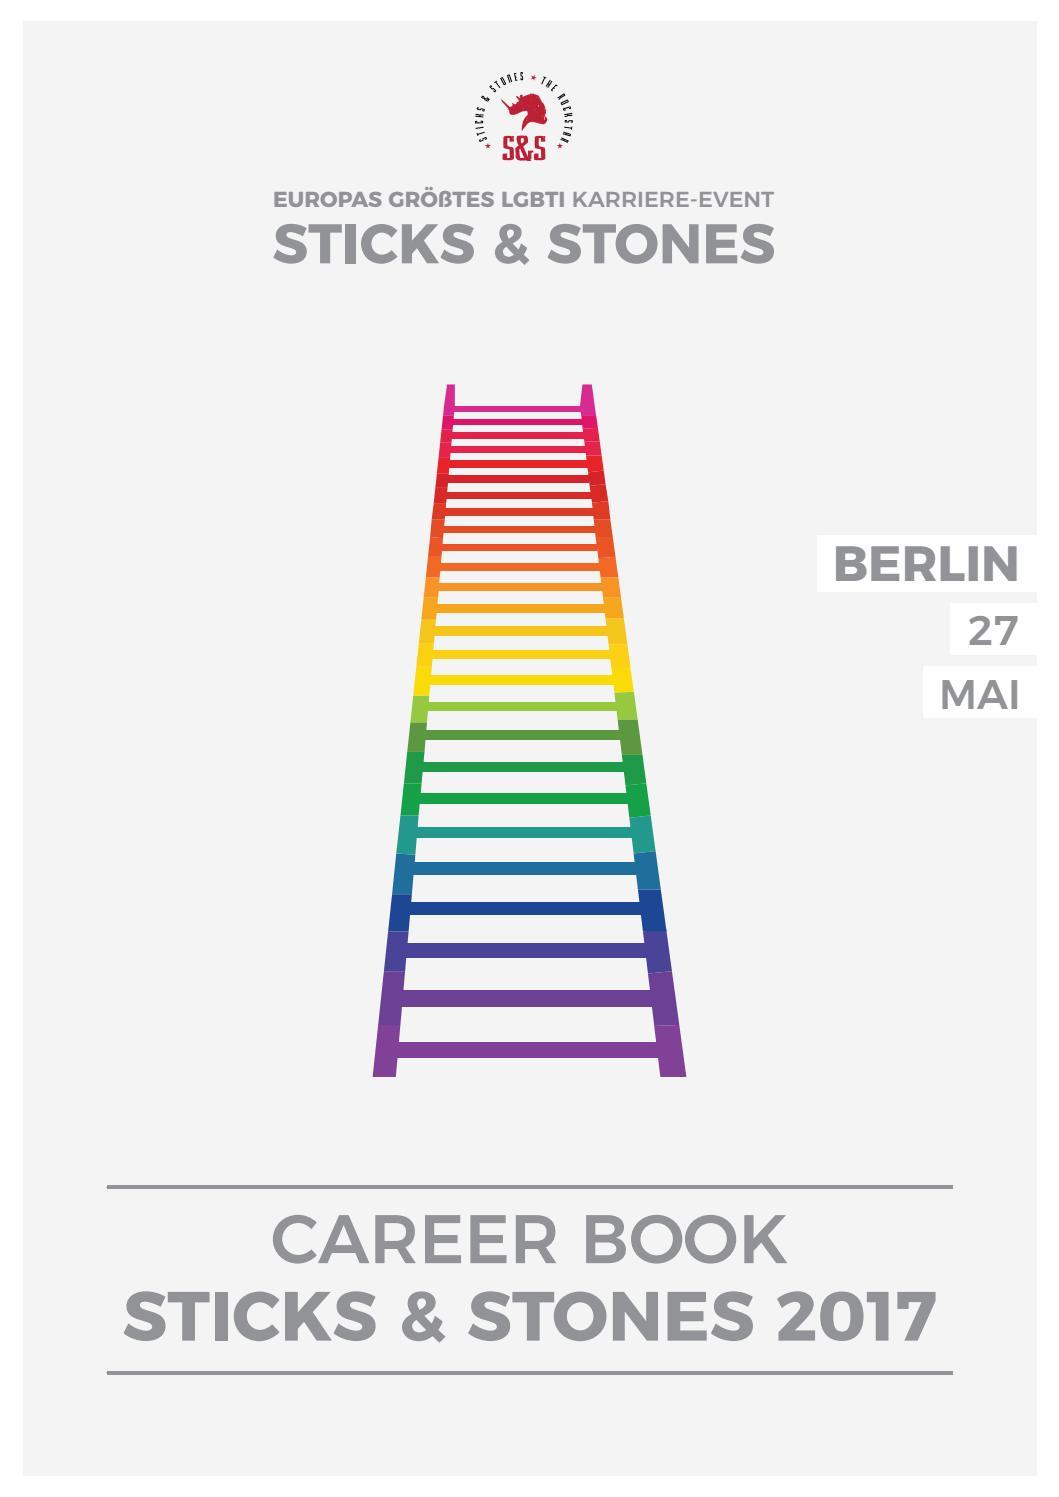 STICKS & STONES Career-Book 2017 by Uhlala_ - issuu